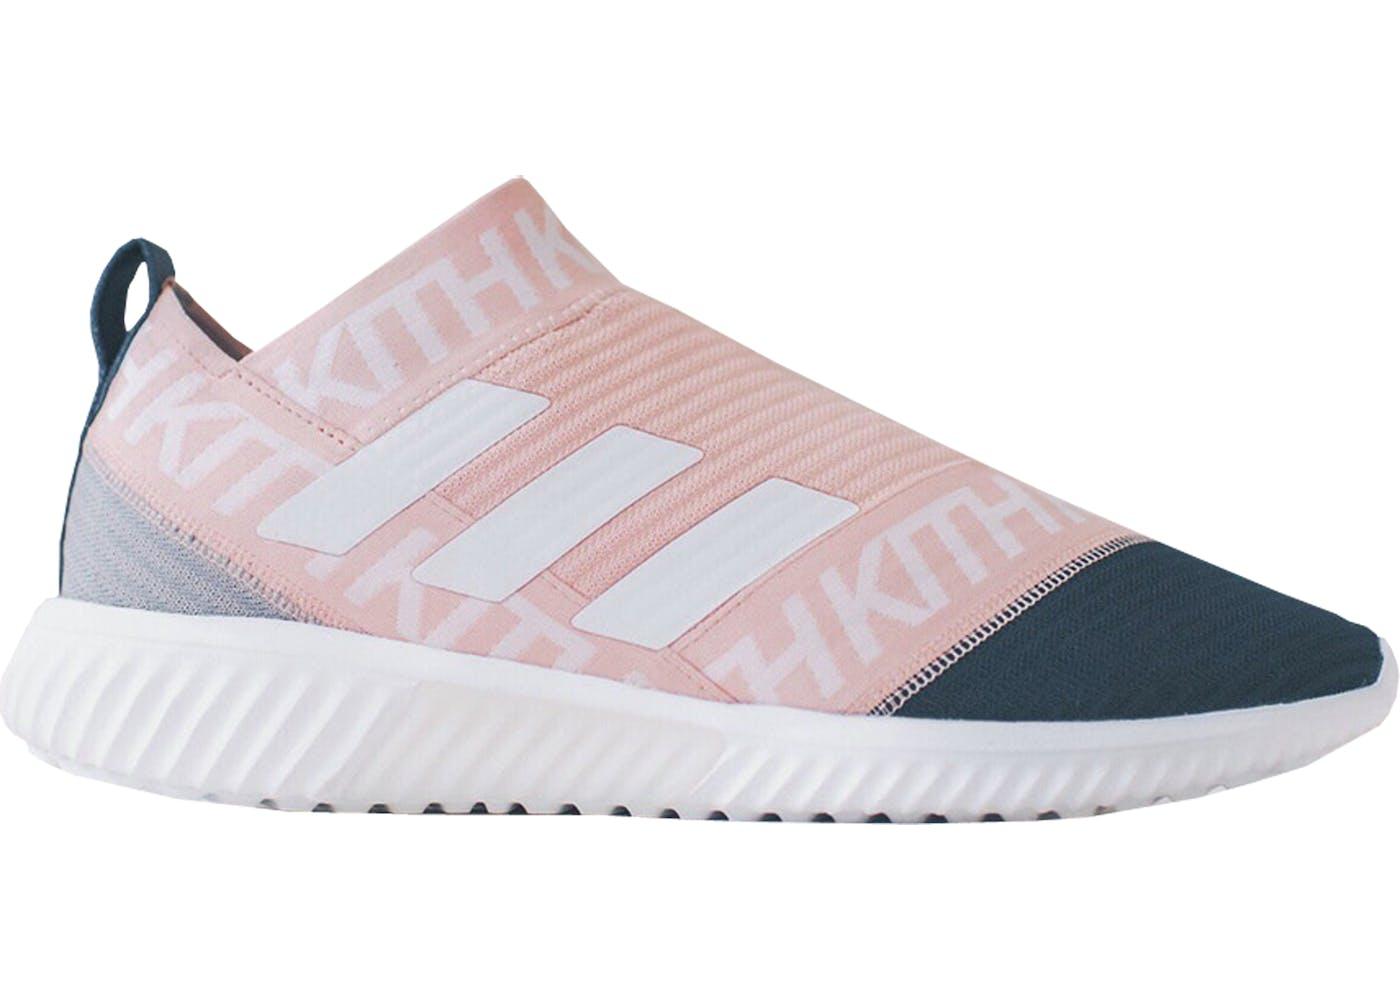 92ddea976 ... Soccer Season 2 Footwear Nemziz Tango Pink 2017 November 3 Release Date  Info Kith x adidas Nemeziz adidas Nemeziz Tango 17.1 Kith Flamingos ...